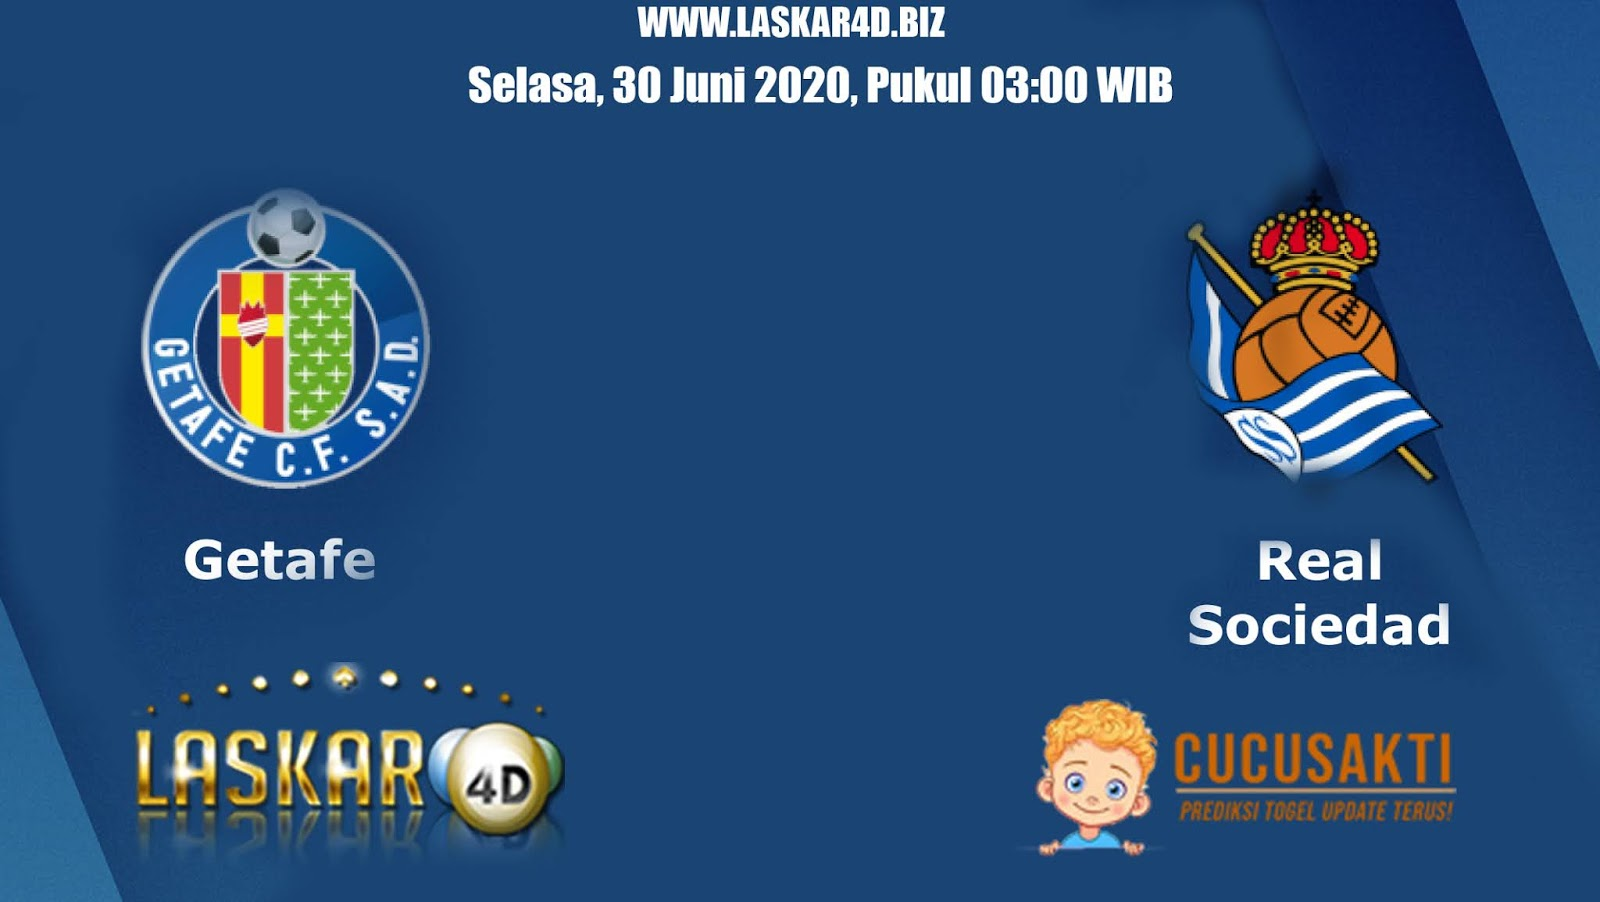 Prediksi Bola Getafe vs Real Sociedad Selasa 30 Juni 2020